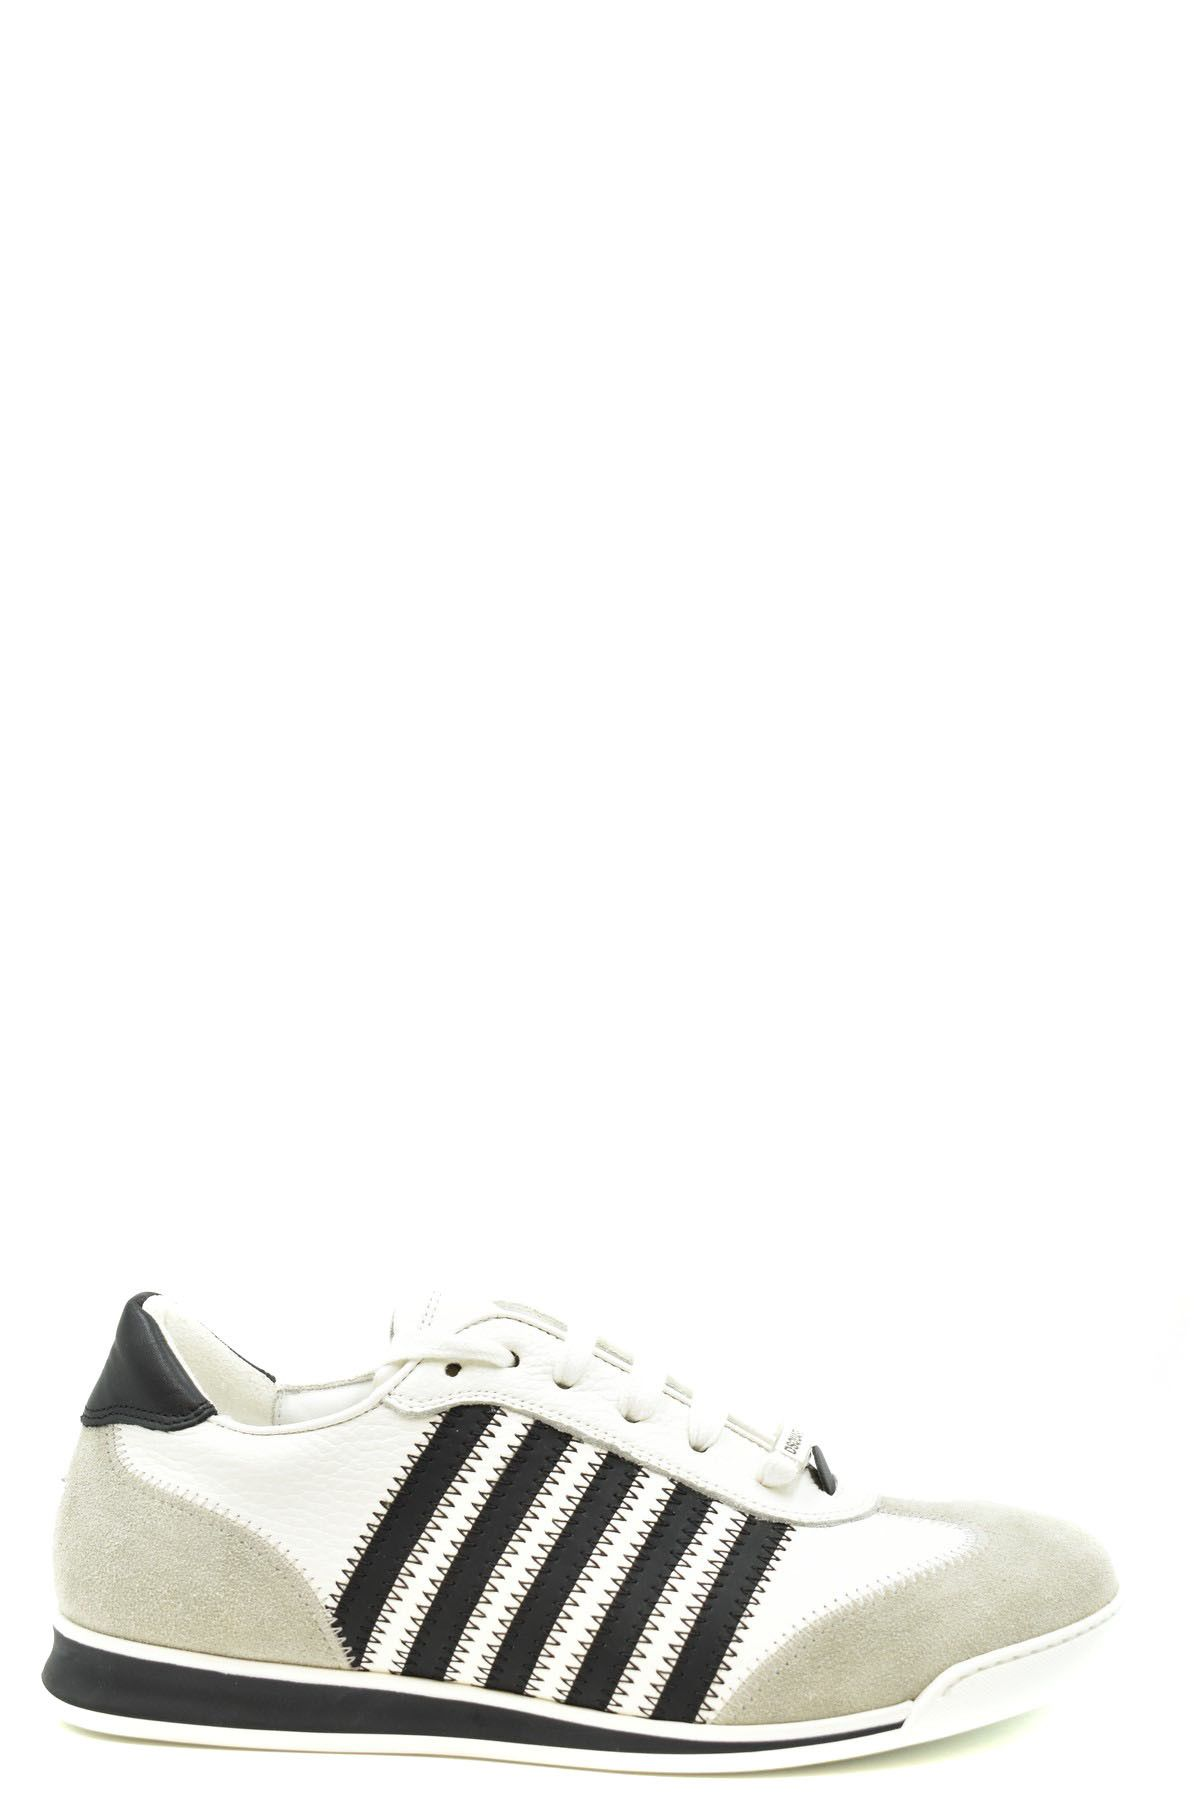 Dsquared Men's Sneakers In White